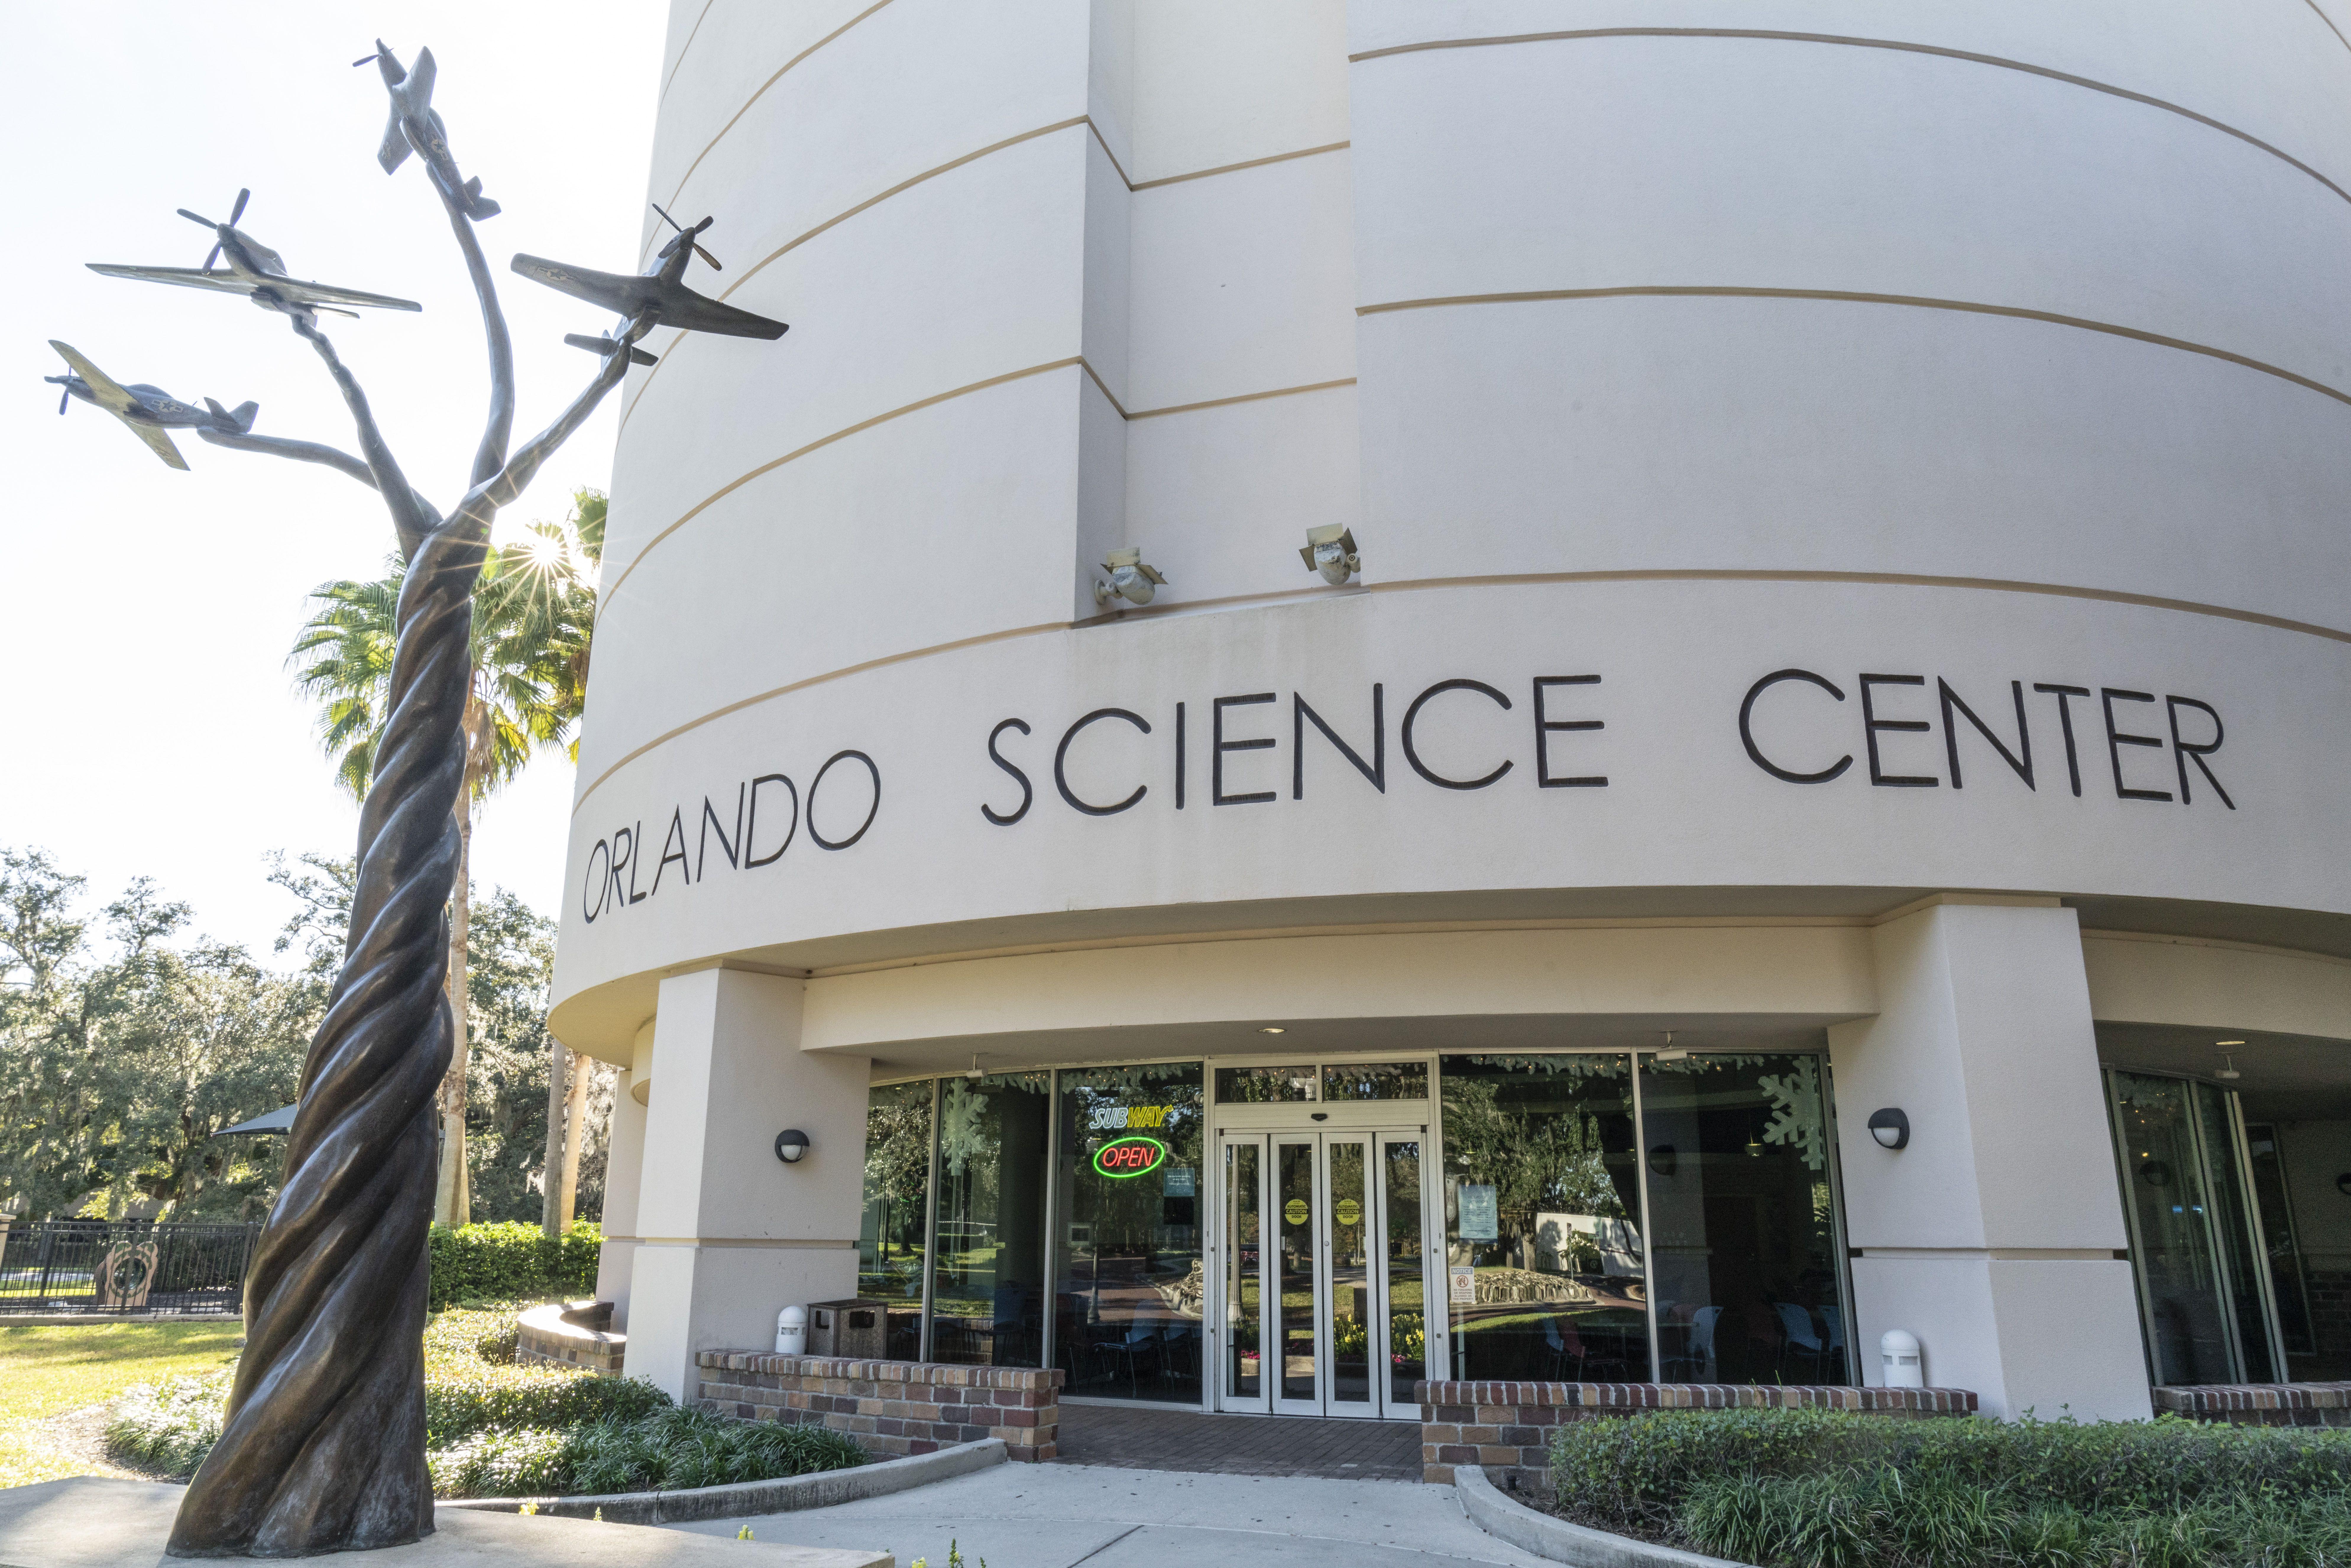 Entrance to the Orlando Science Center